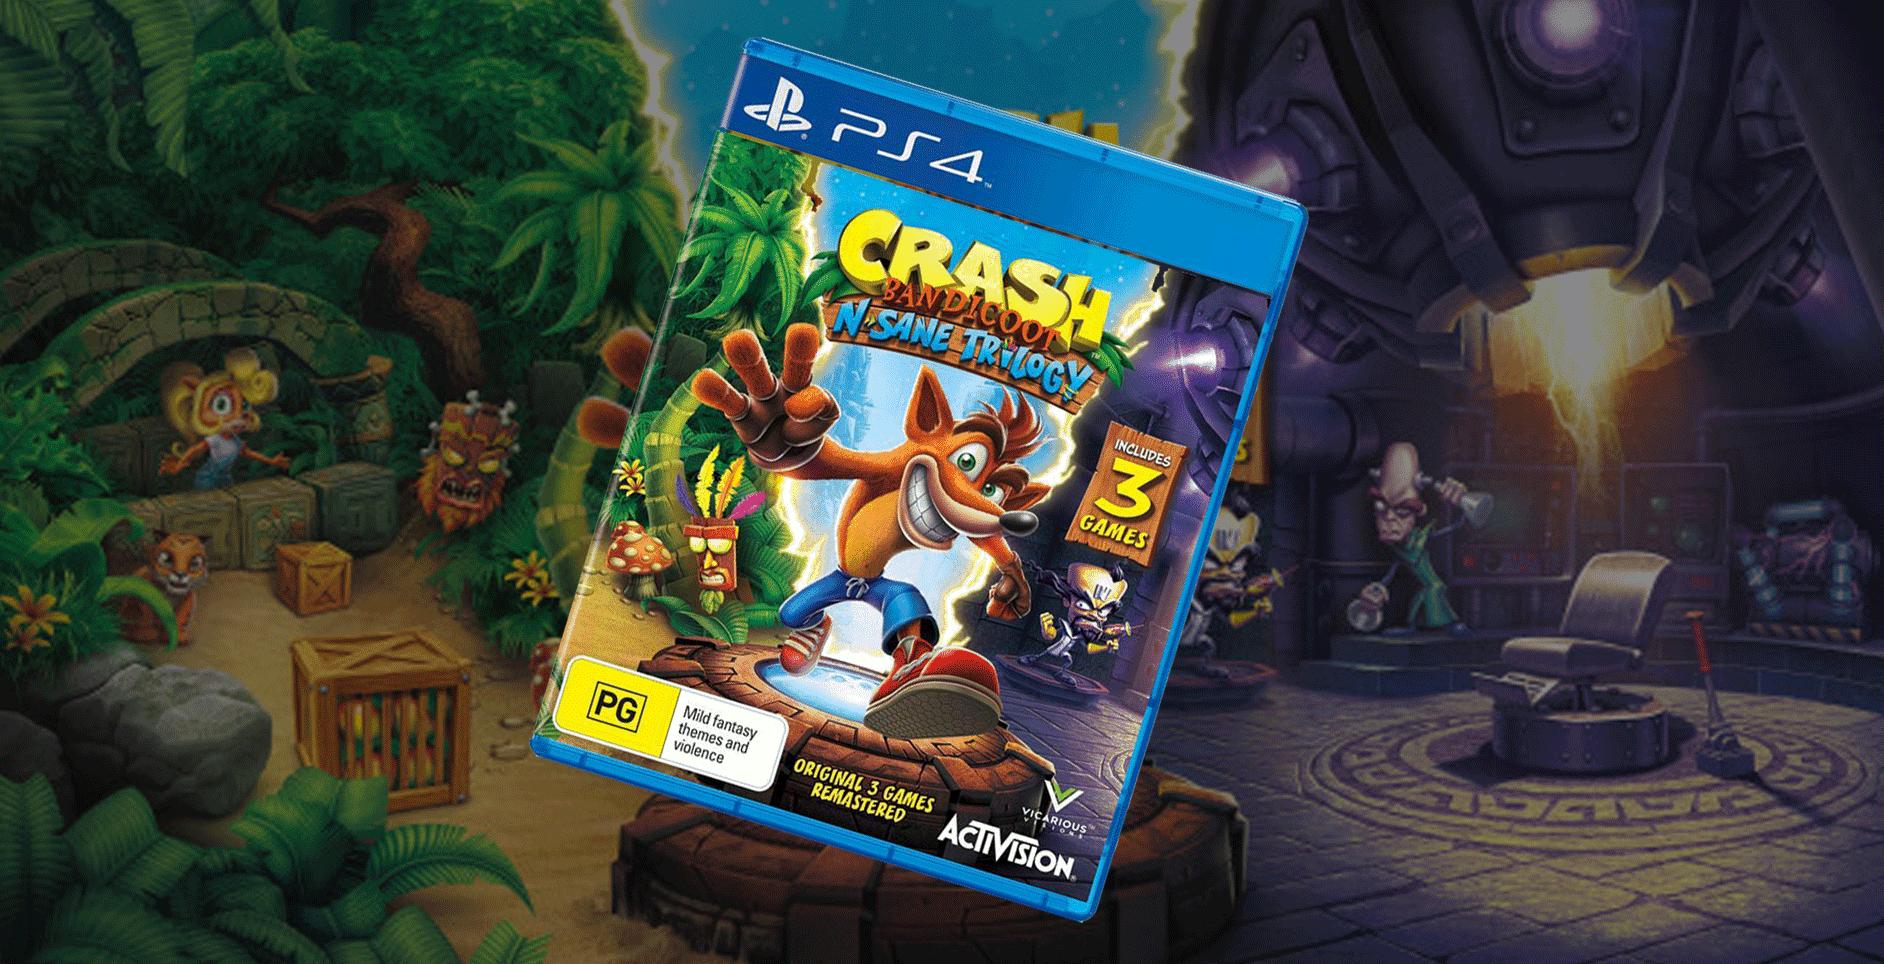 Crash Twinsanity Para Pc Game Hack javahamn PC-Crash-Bandicoot-N-Sane-Trilogy-SaveGame